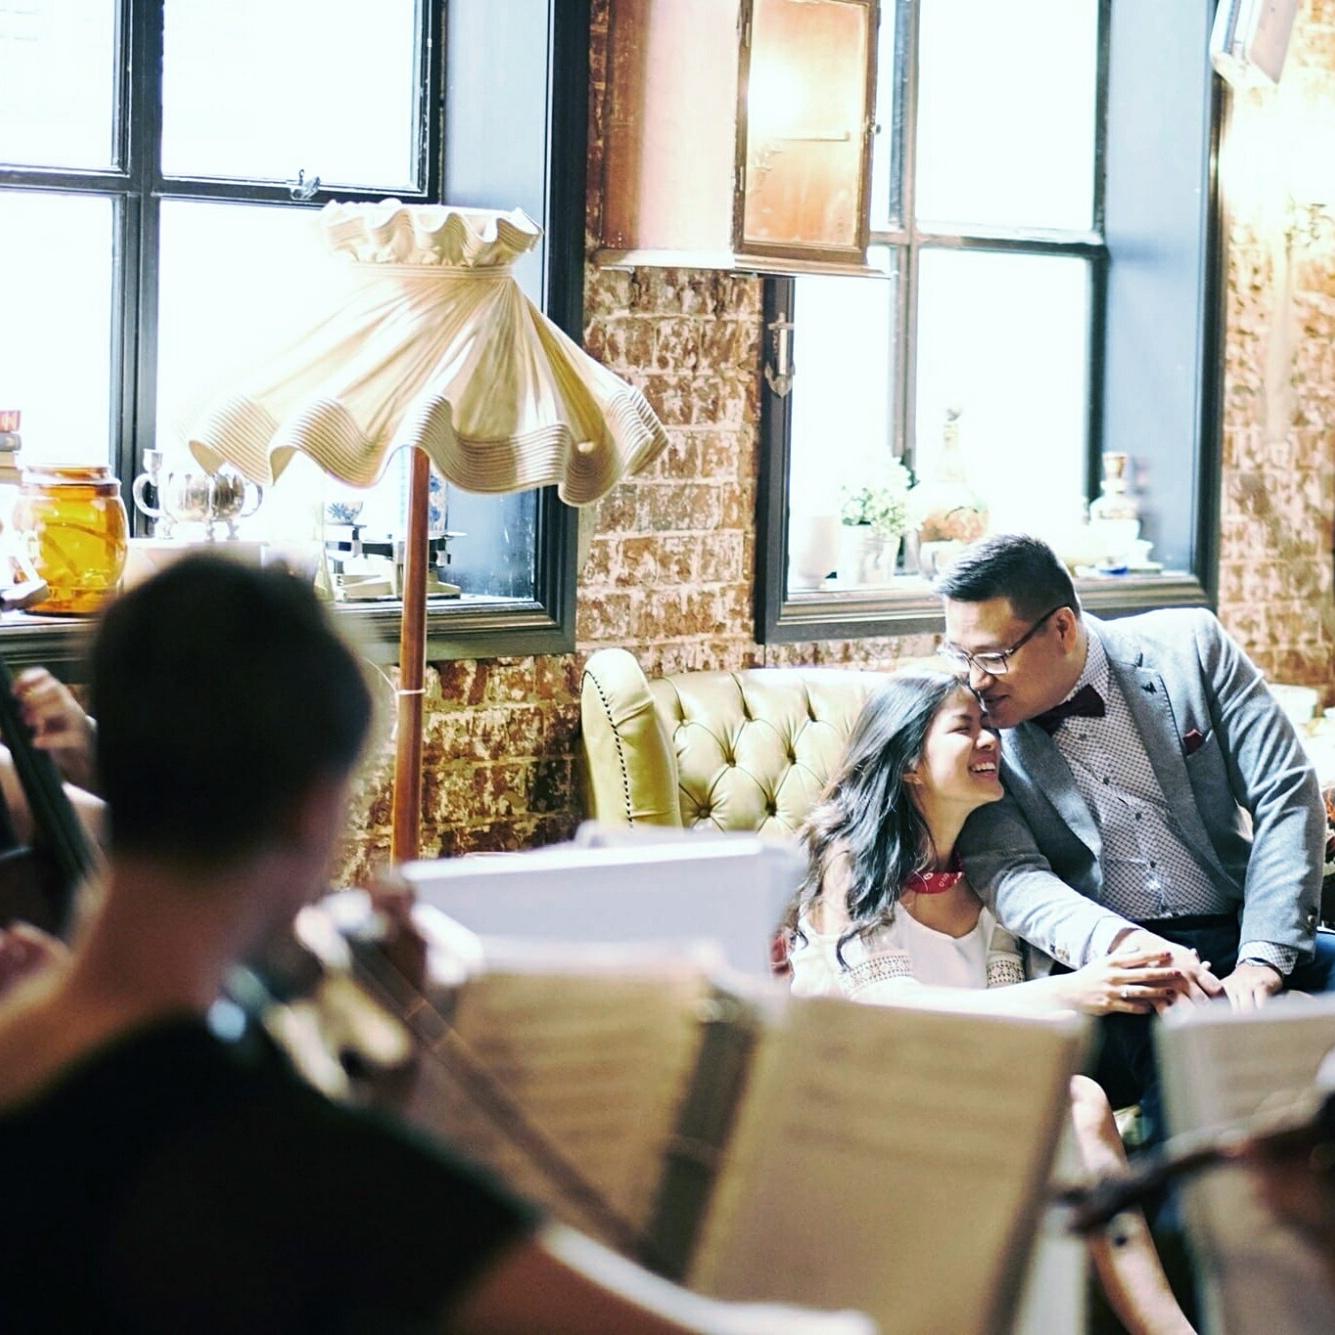 perth-function-string-music-hire-wedding-riverside-proposal-quartet-wolf-lane-marriage